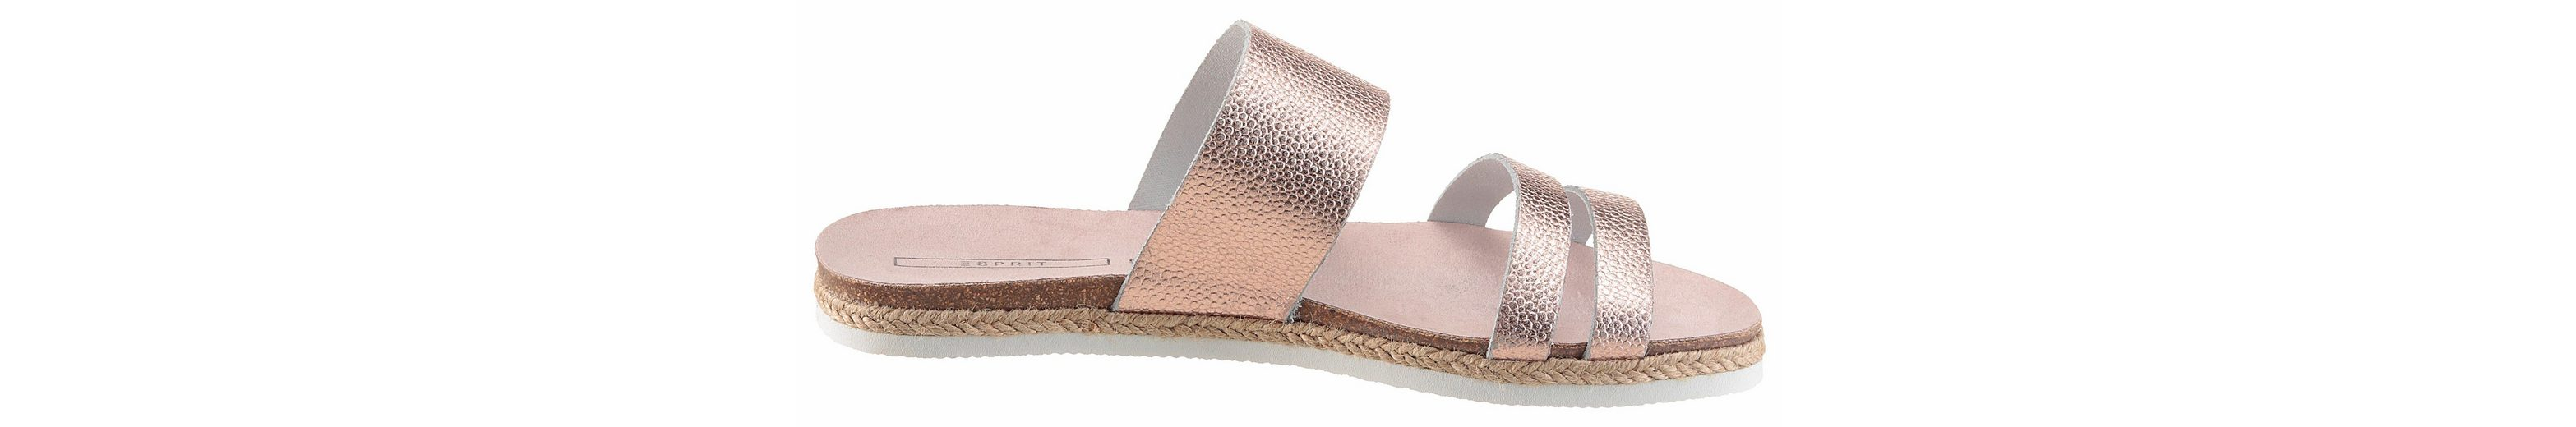 ESPRIT Keita Slide Pantolette, in modischem Metallic-Look